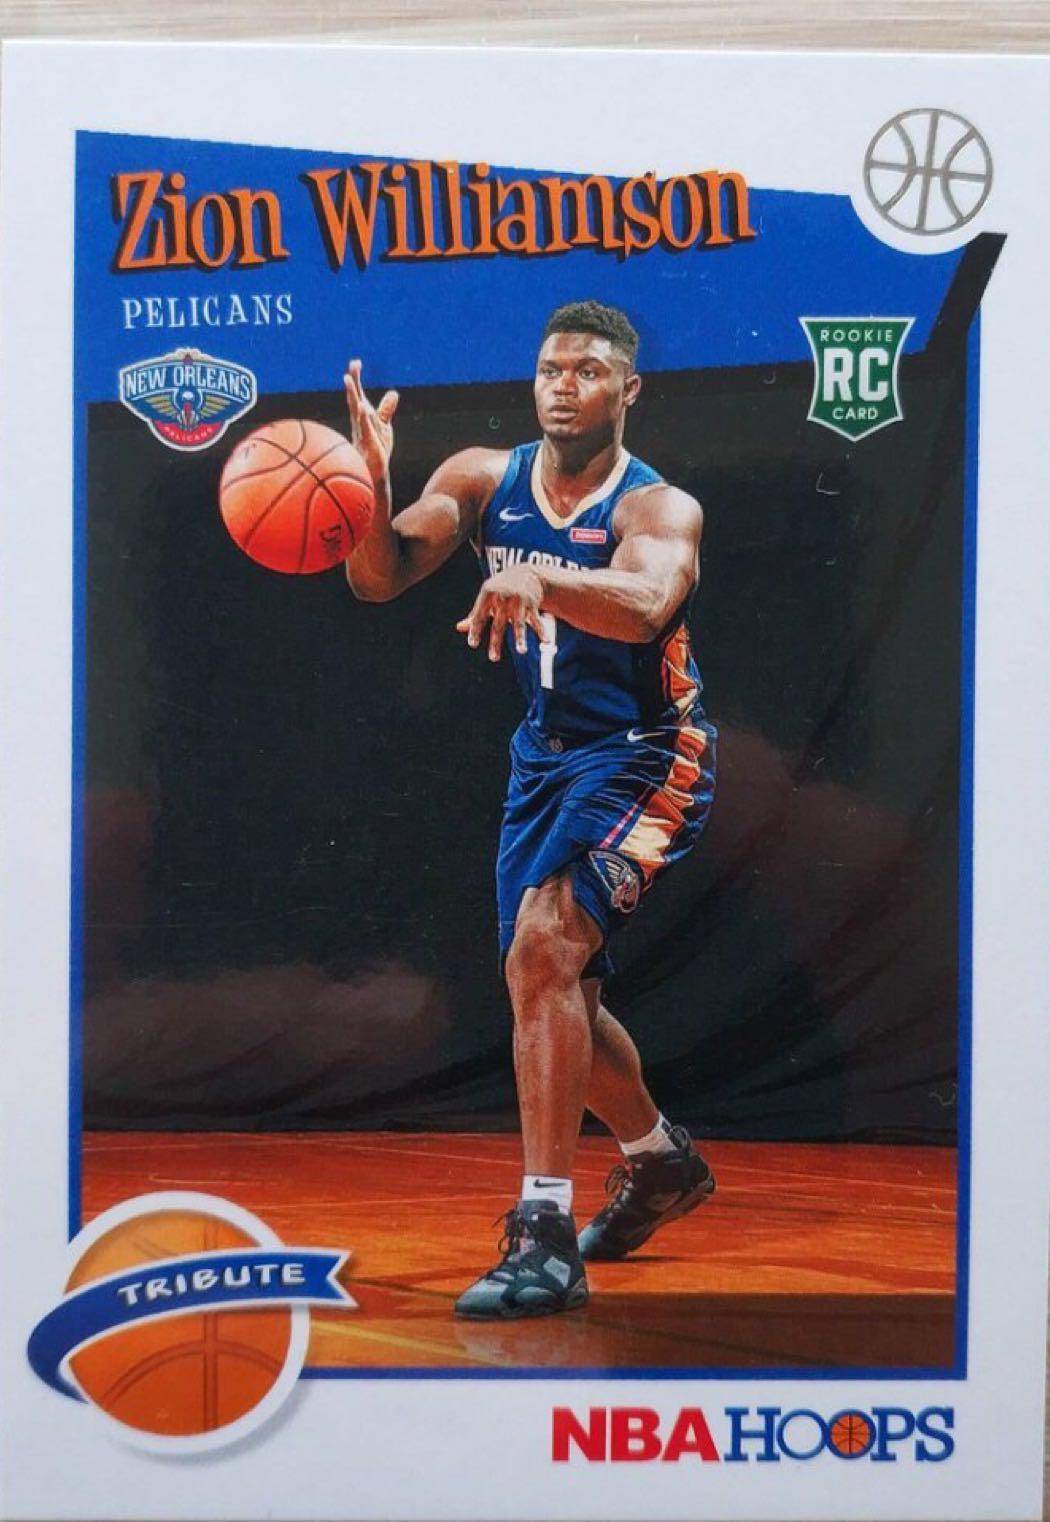 NBA 球員卡 Zion Williamson 2019-20 Hoops RC新人卡Tribute 2020選秀狀元